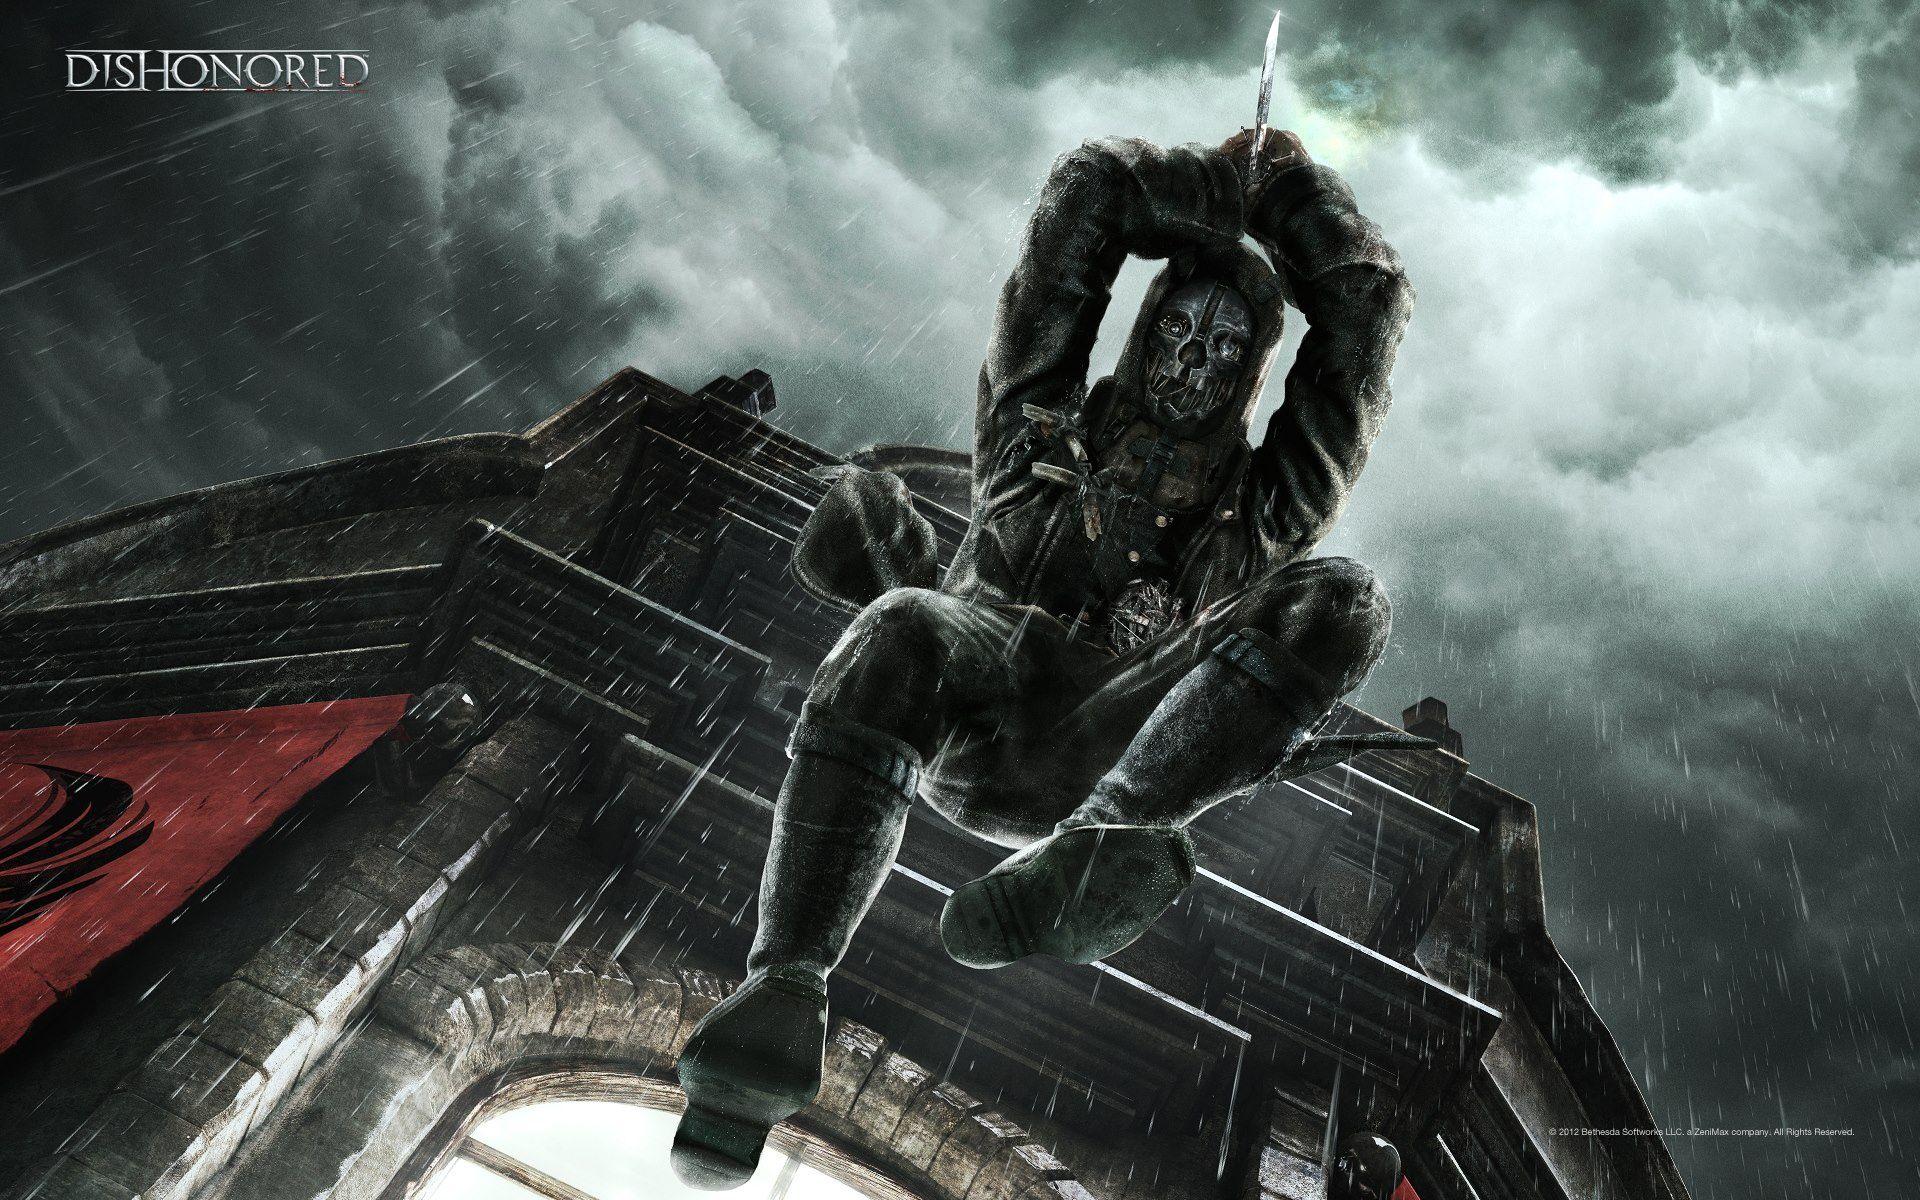 Dishonored Video Game Hd Desktop Wallpaper Wallpapersme